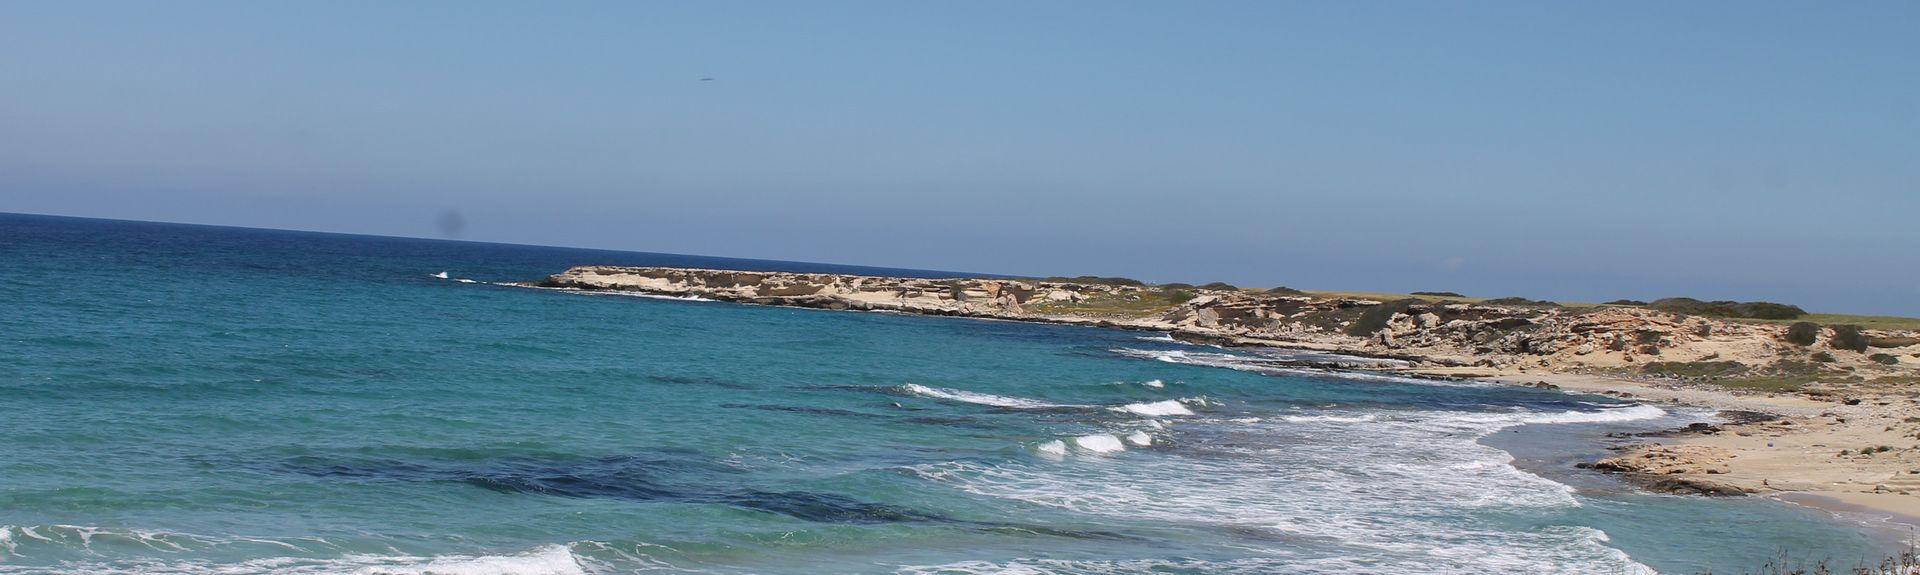 Karaagaรง, Chypre